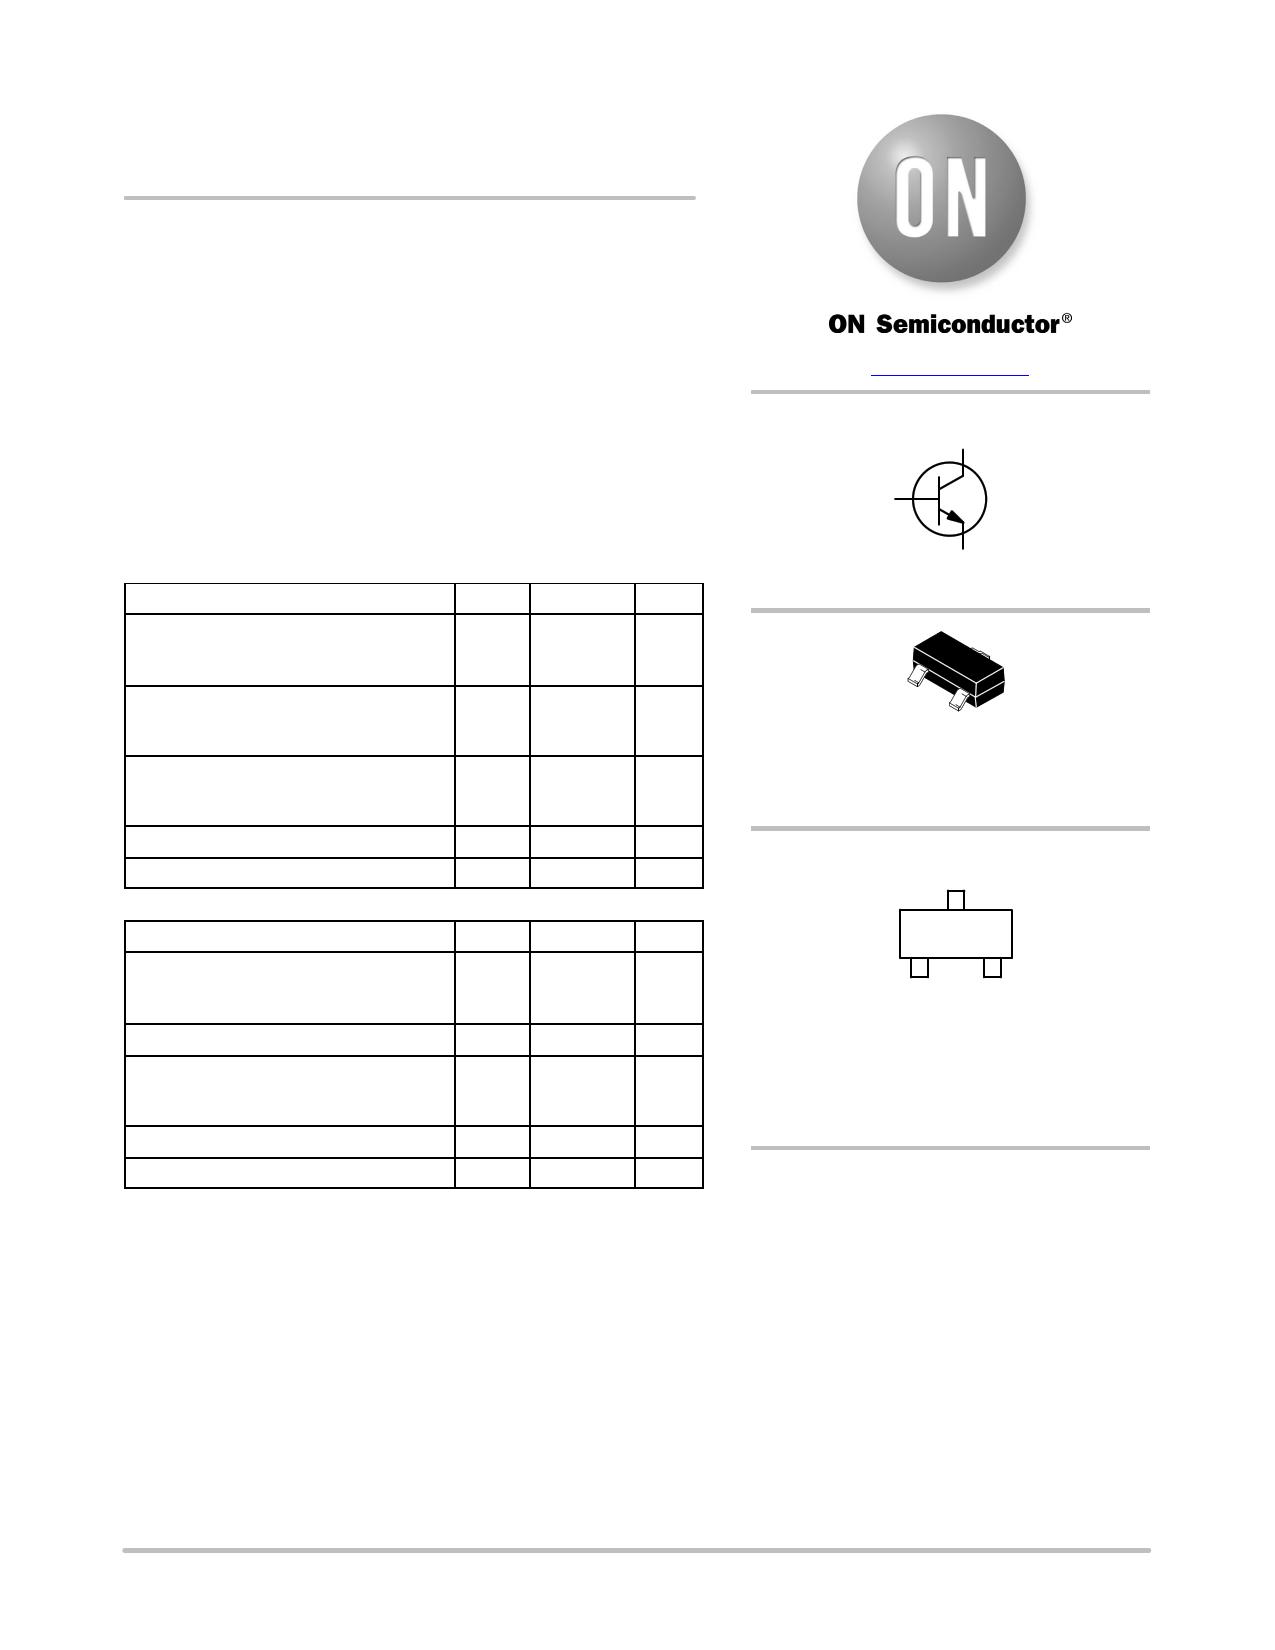 MMBT2222AL Datasheet, MMBT2222AL PDF,ピン配置, 機能